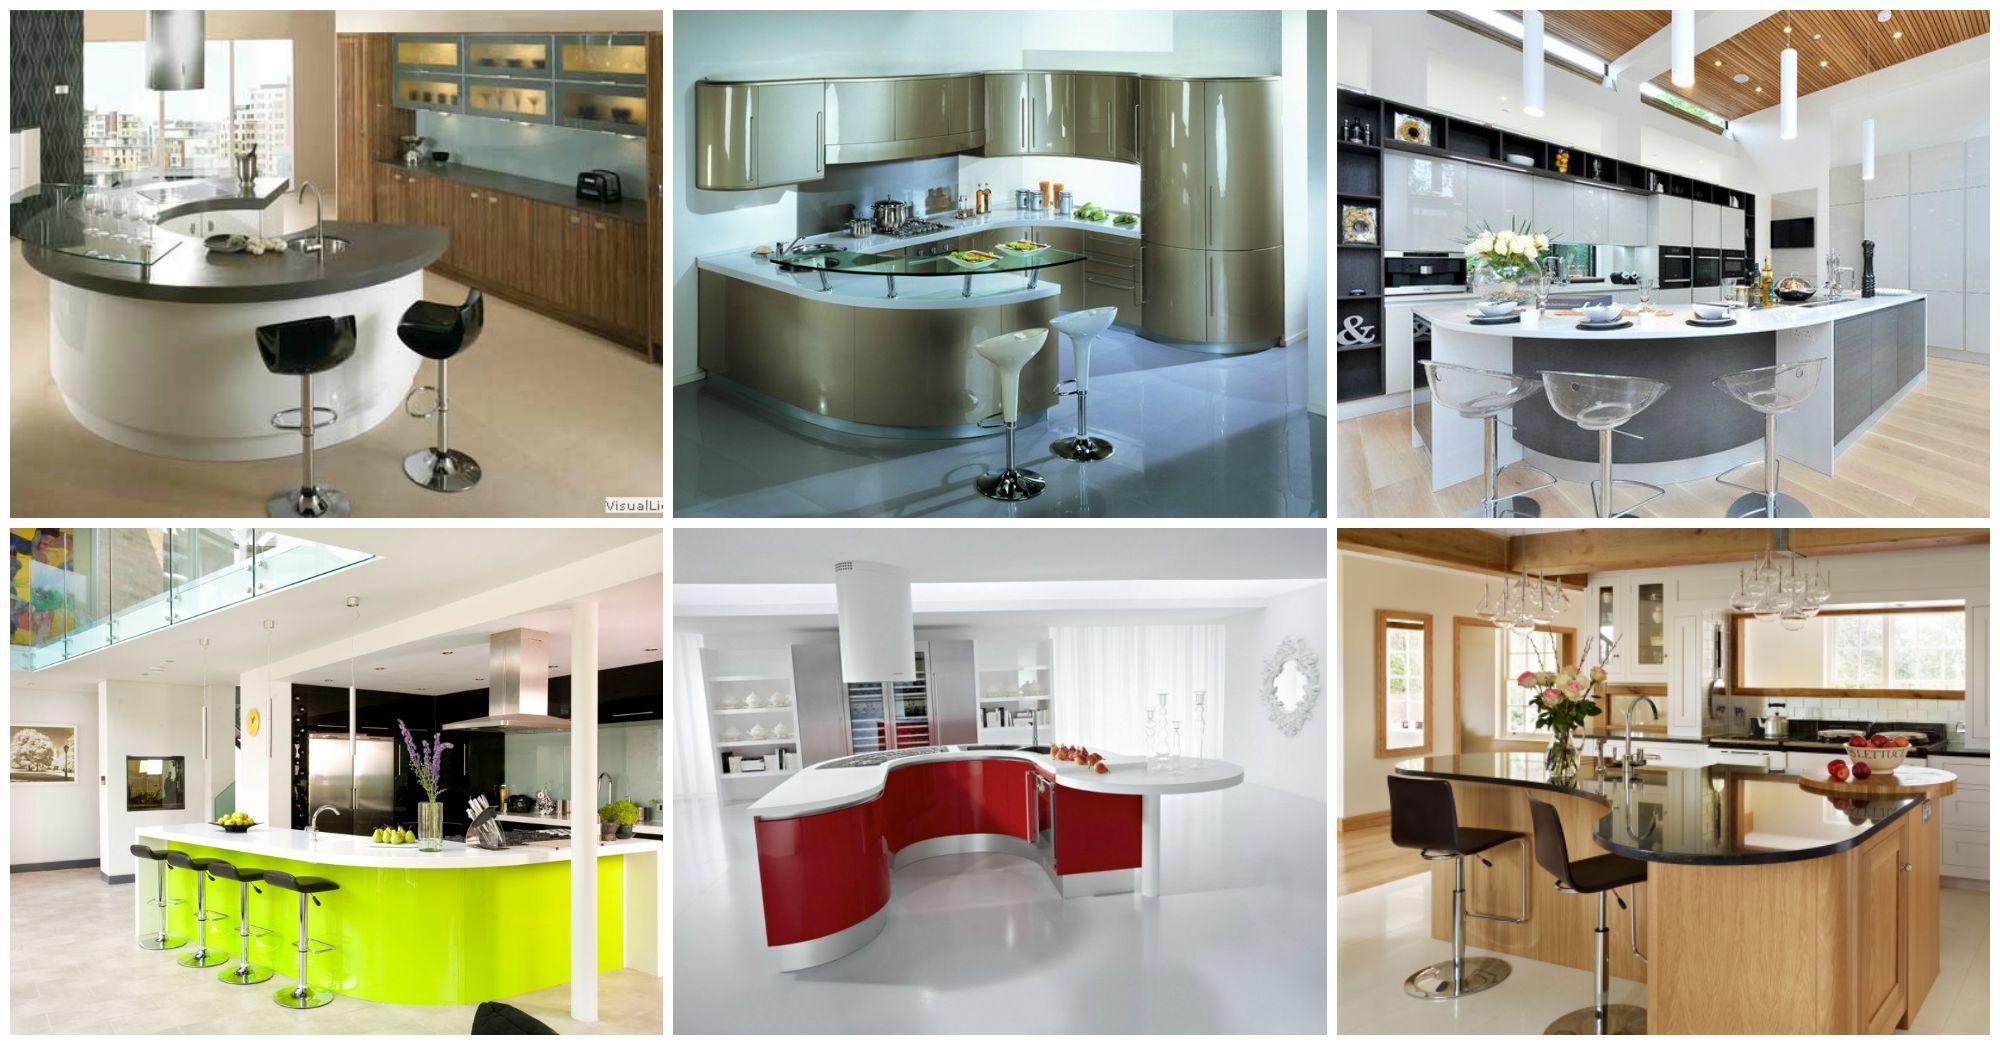 10 amazing curved kitchen islands